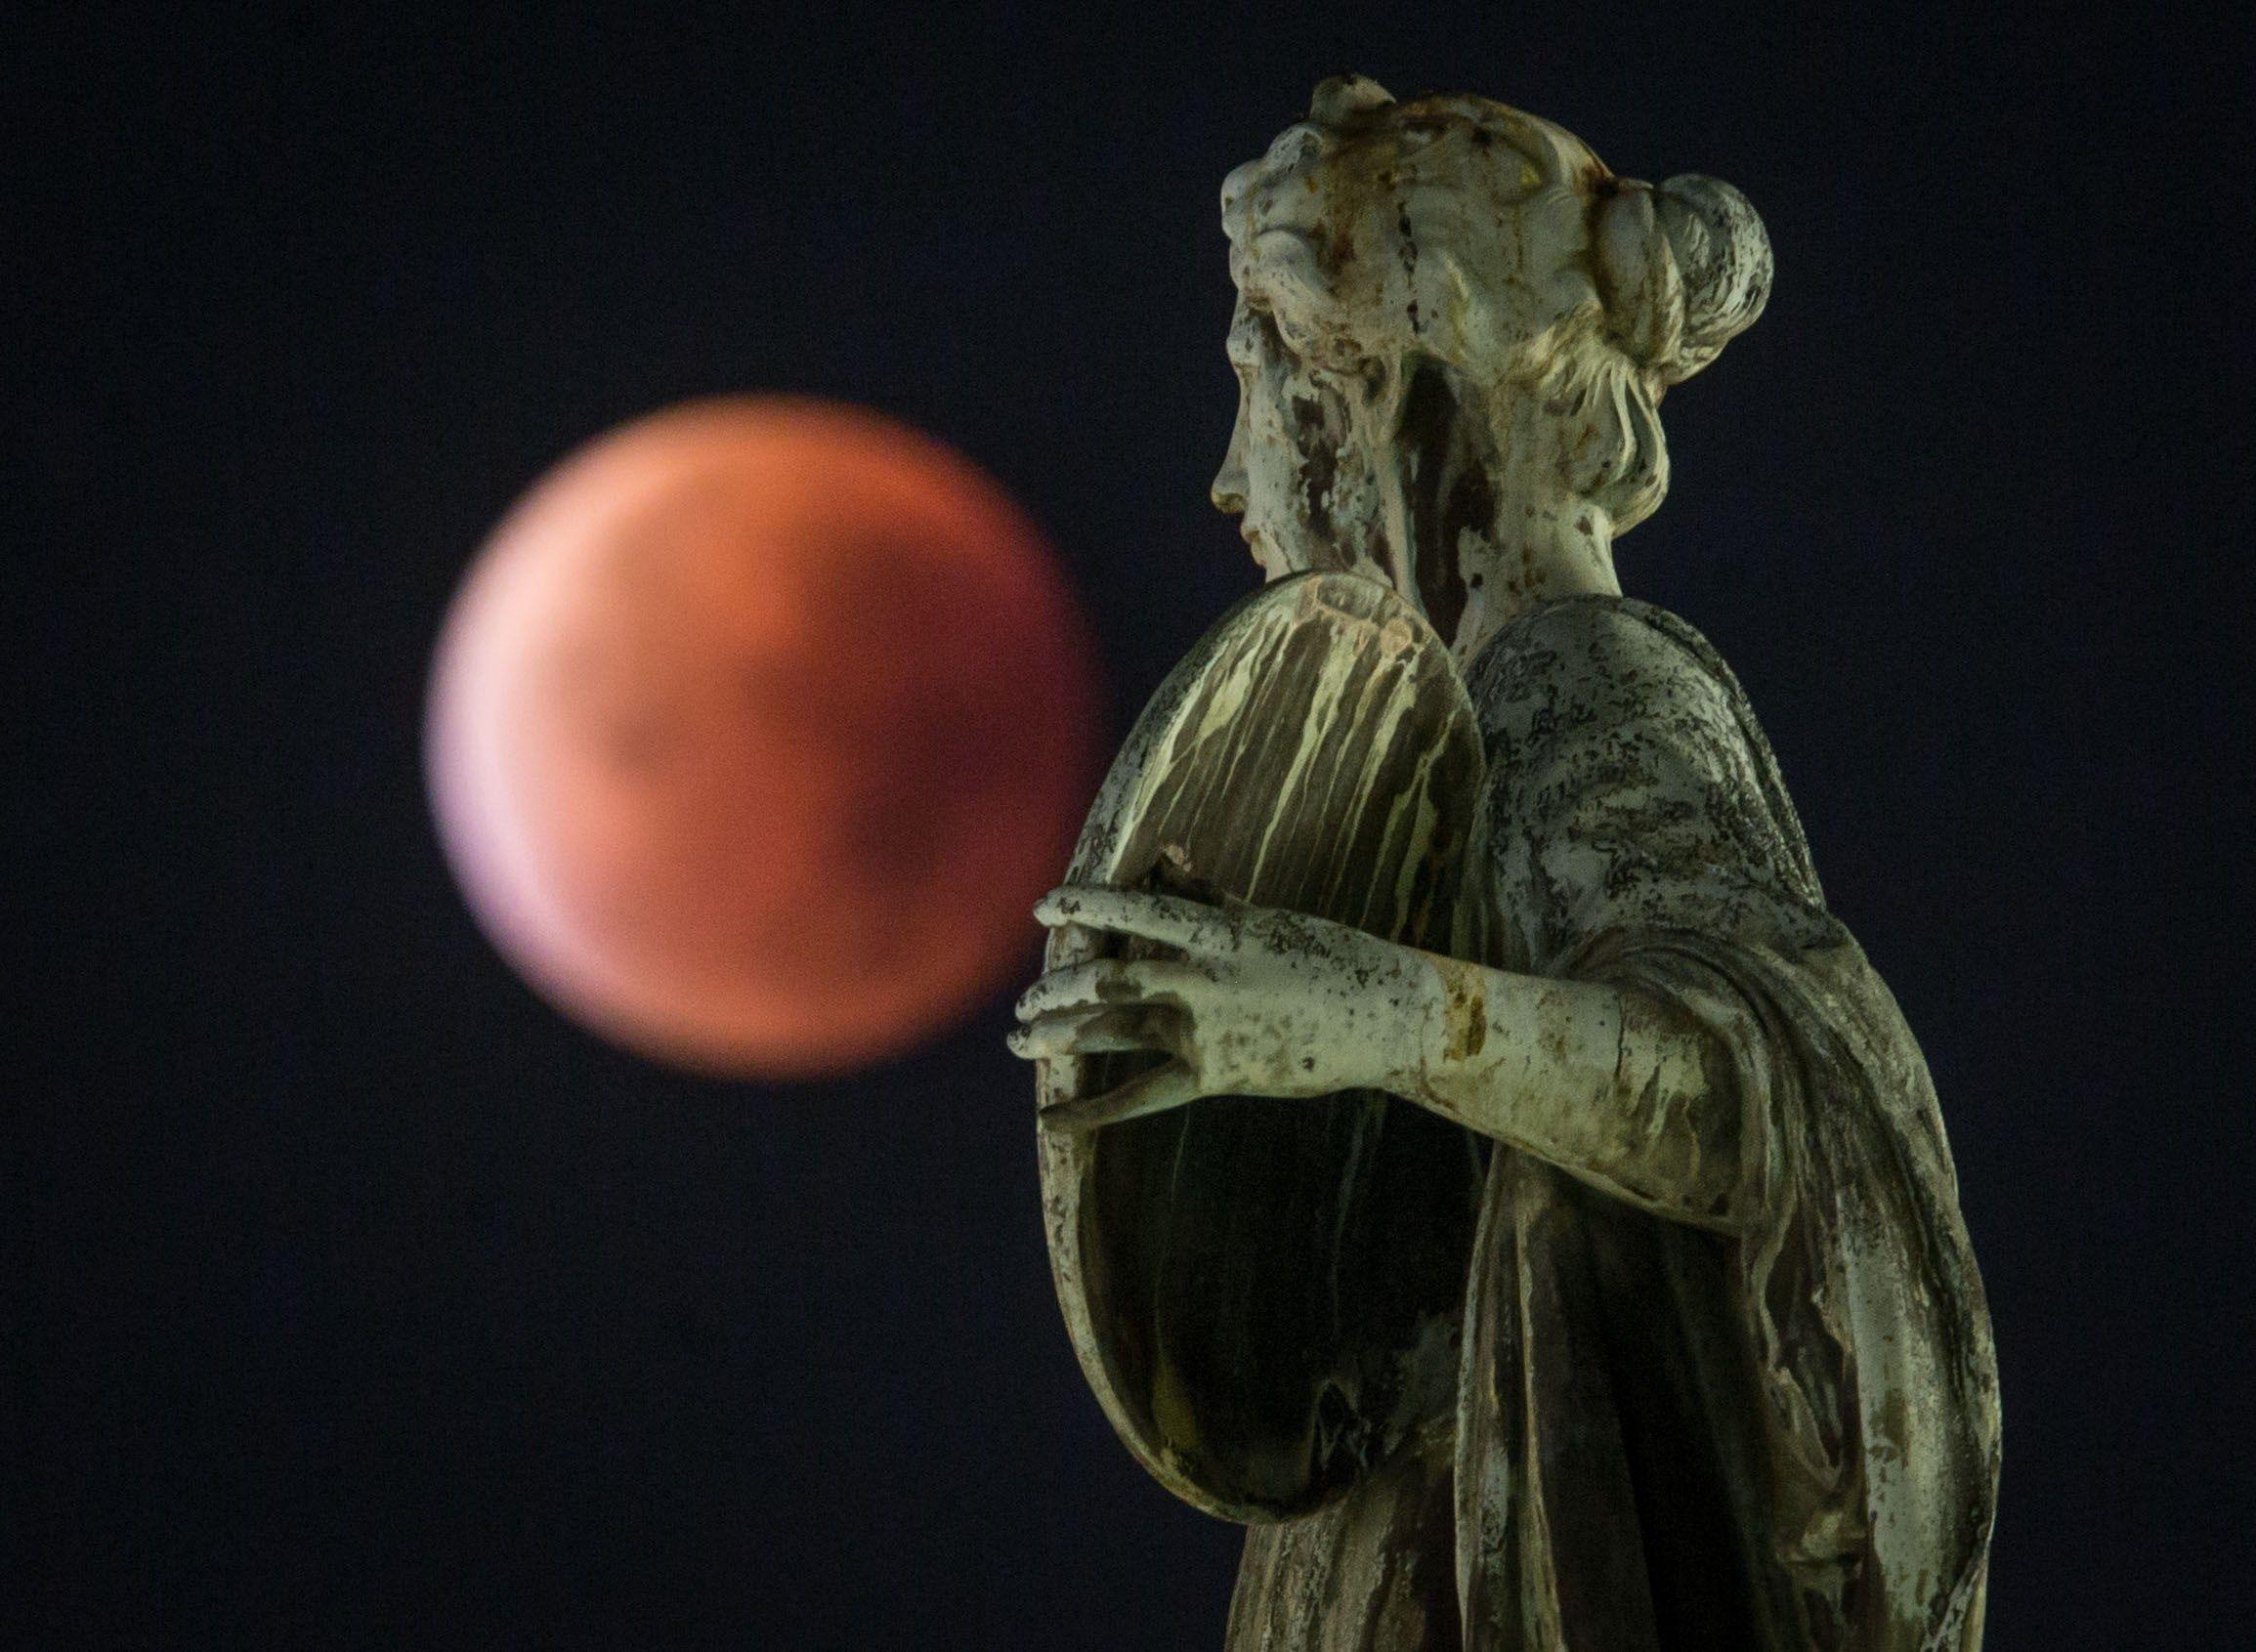 1_4_Total Lunar Eclipse